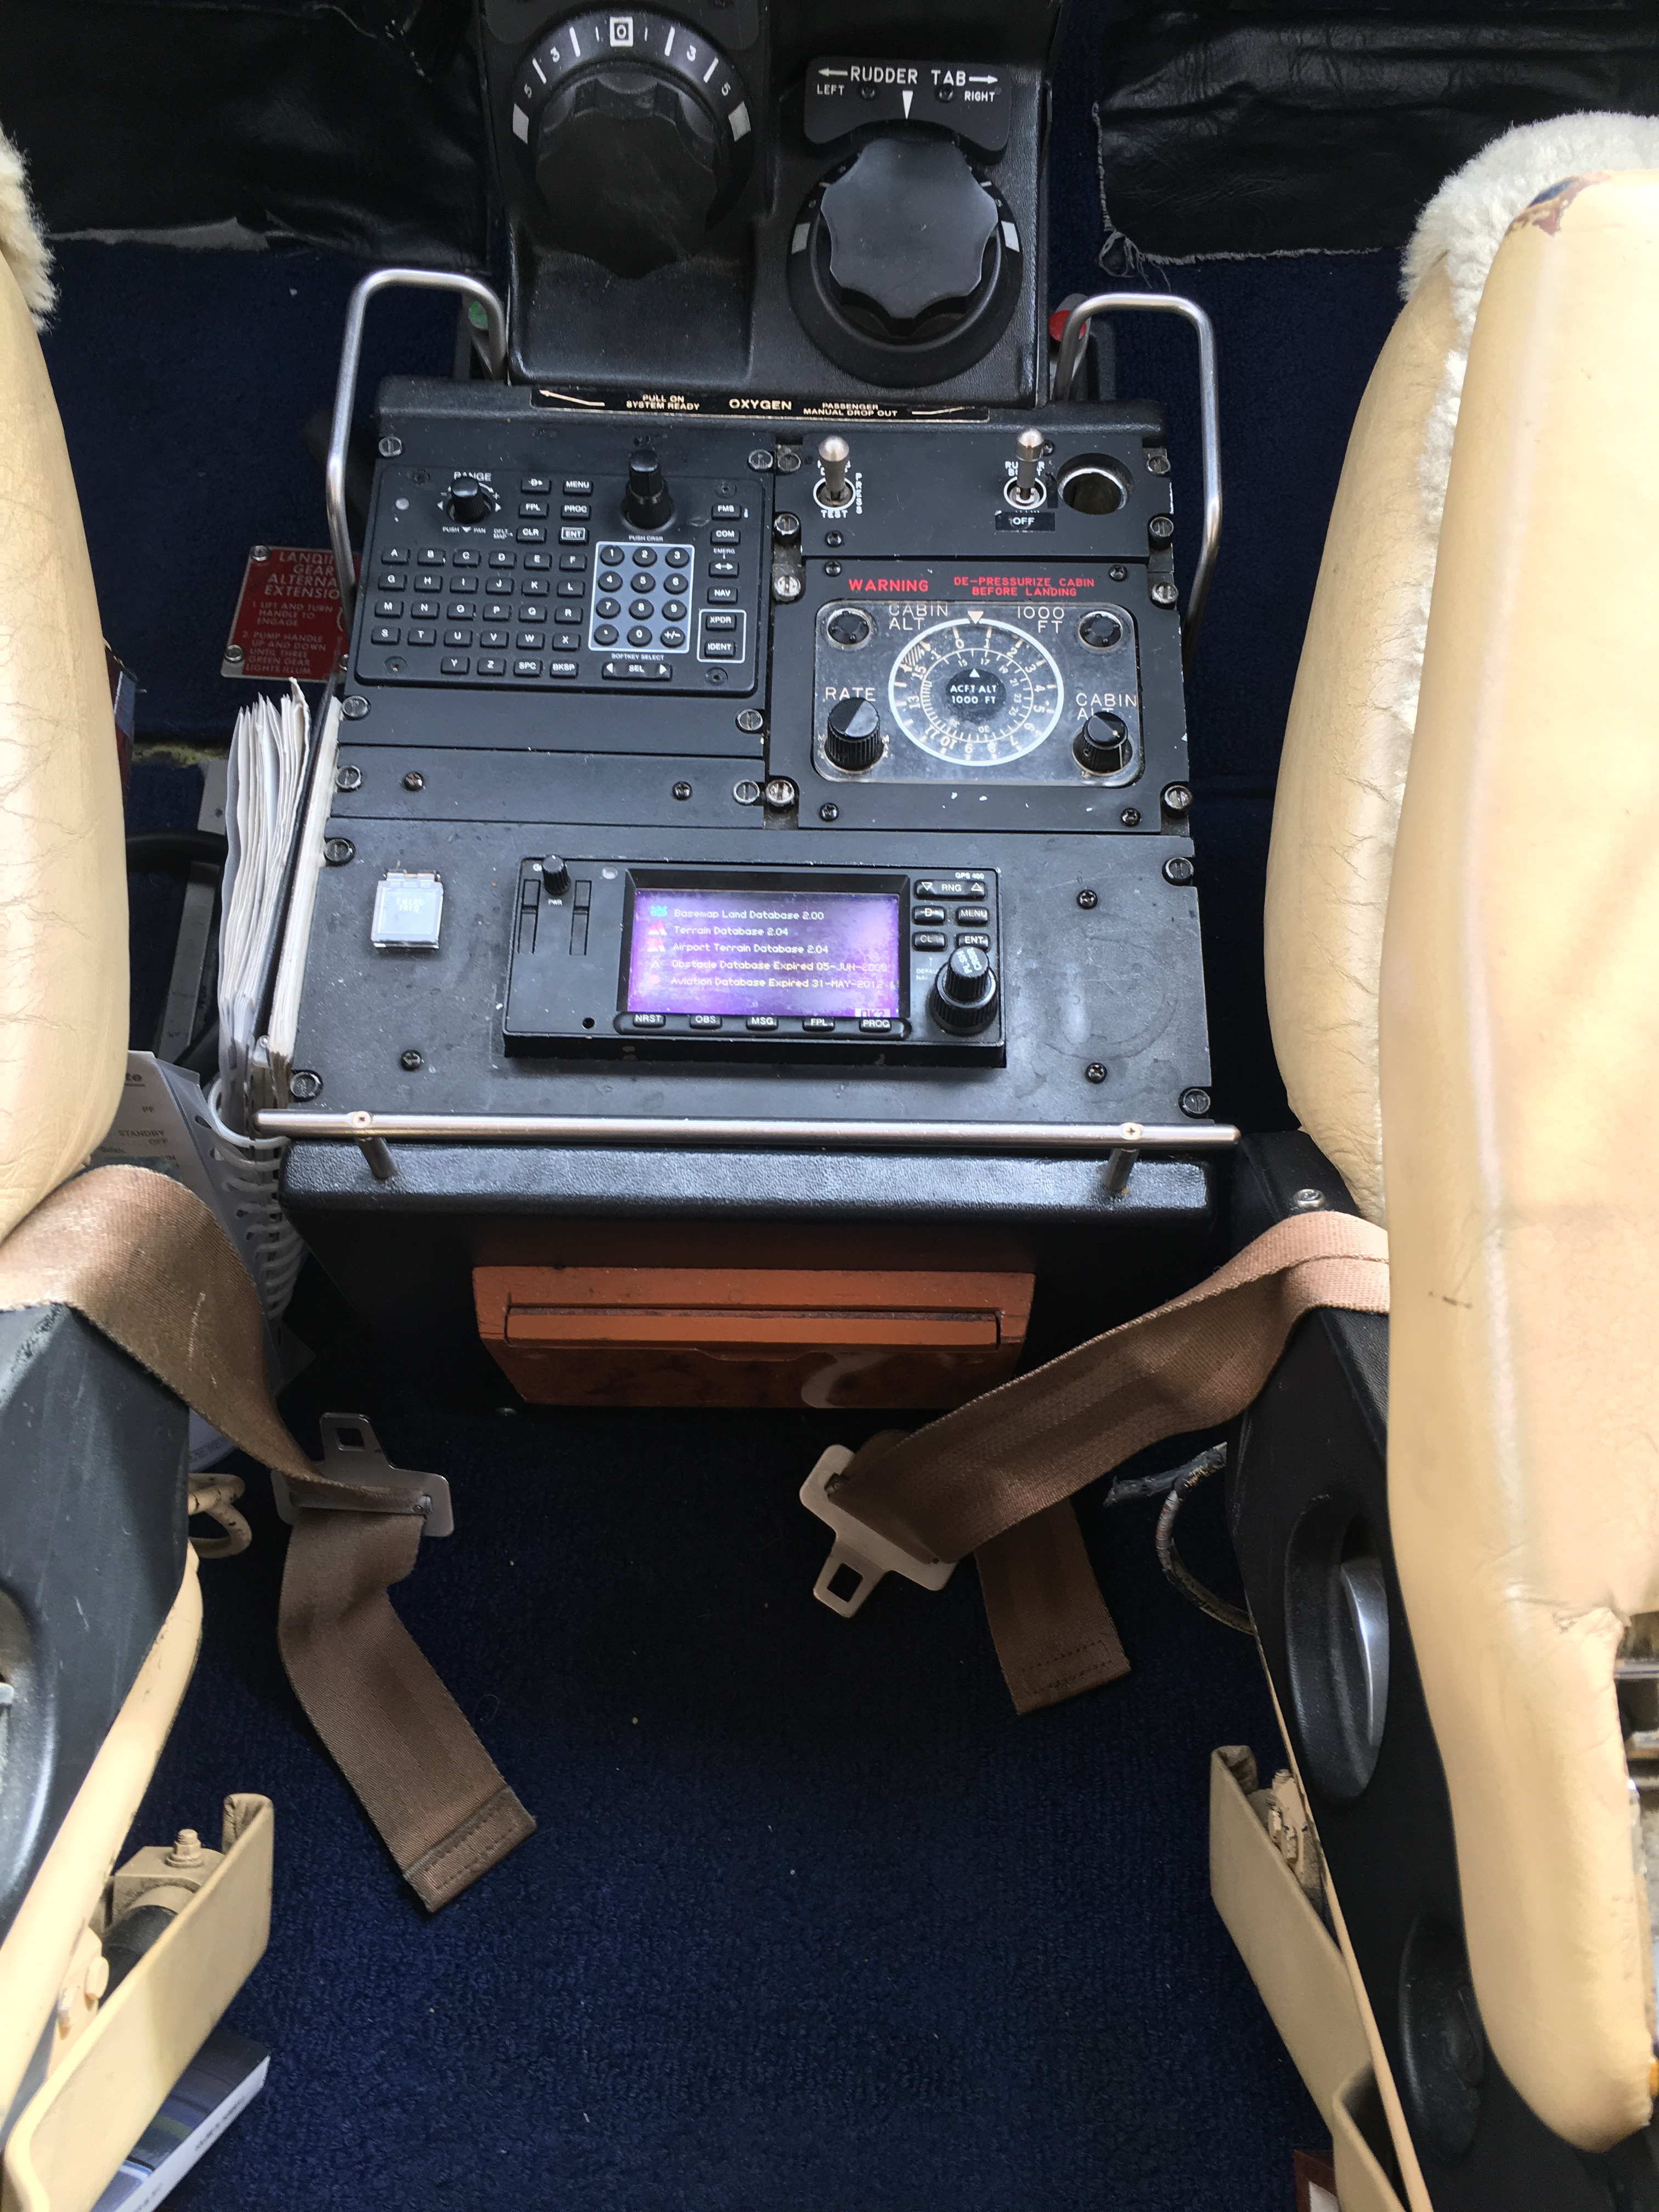 King Air 300 panel